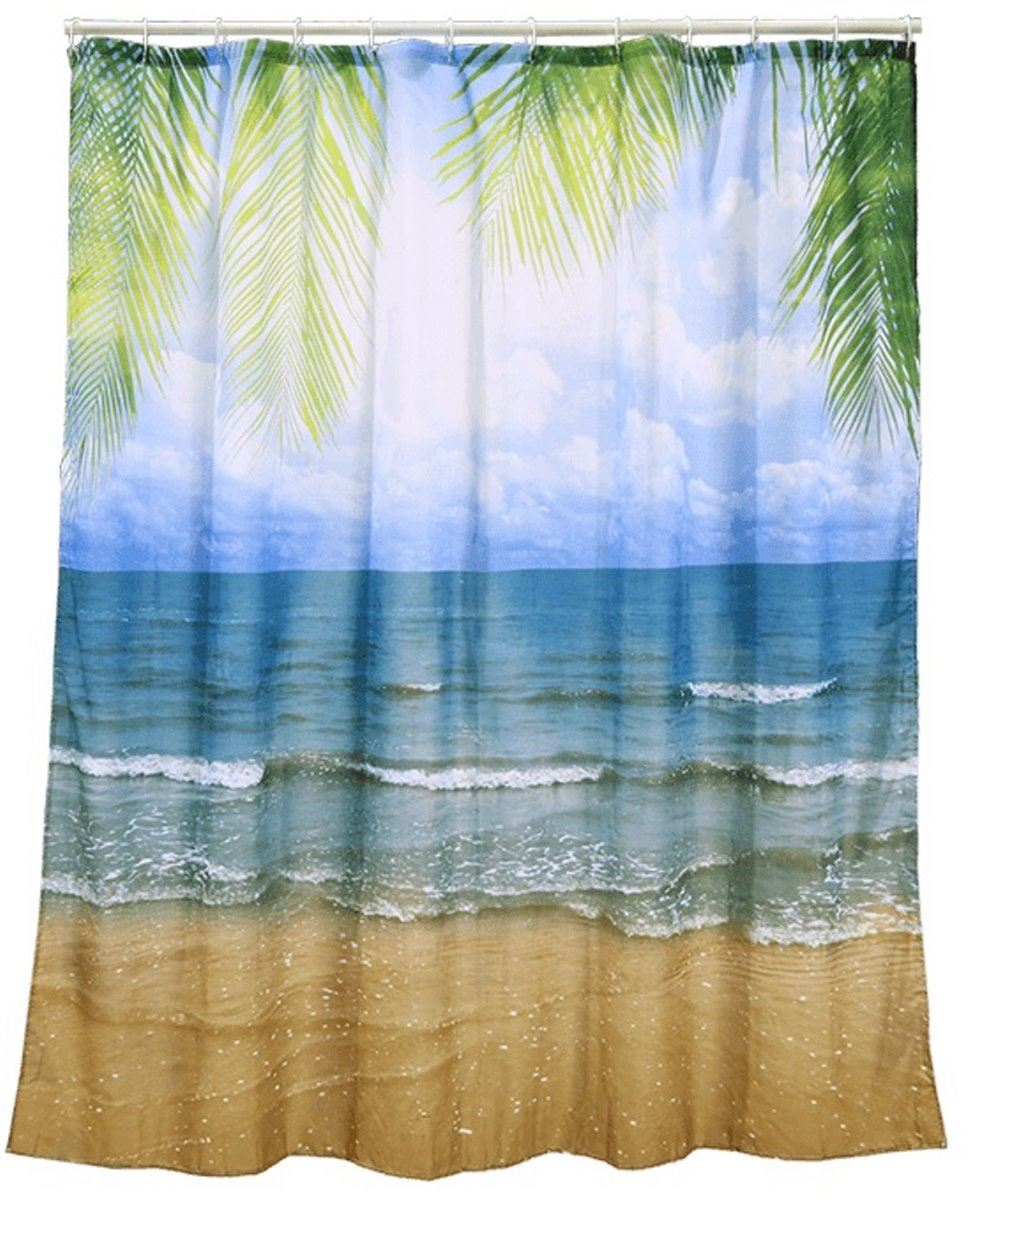 Details About Shower Curtain Bathroom Hooks Bath Novelty Gift